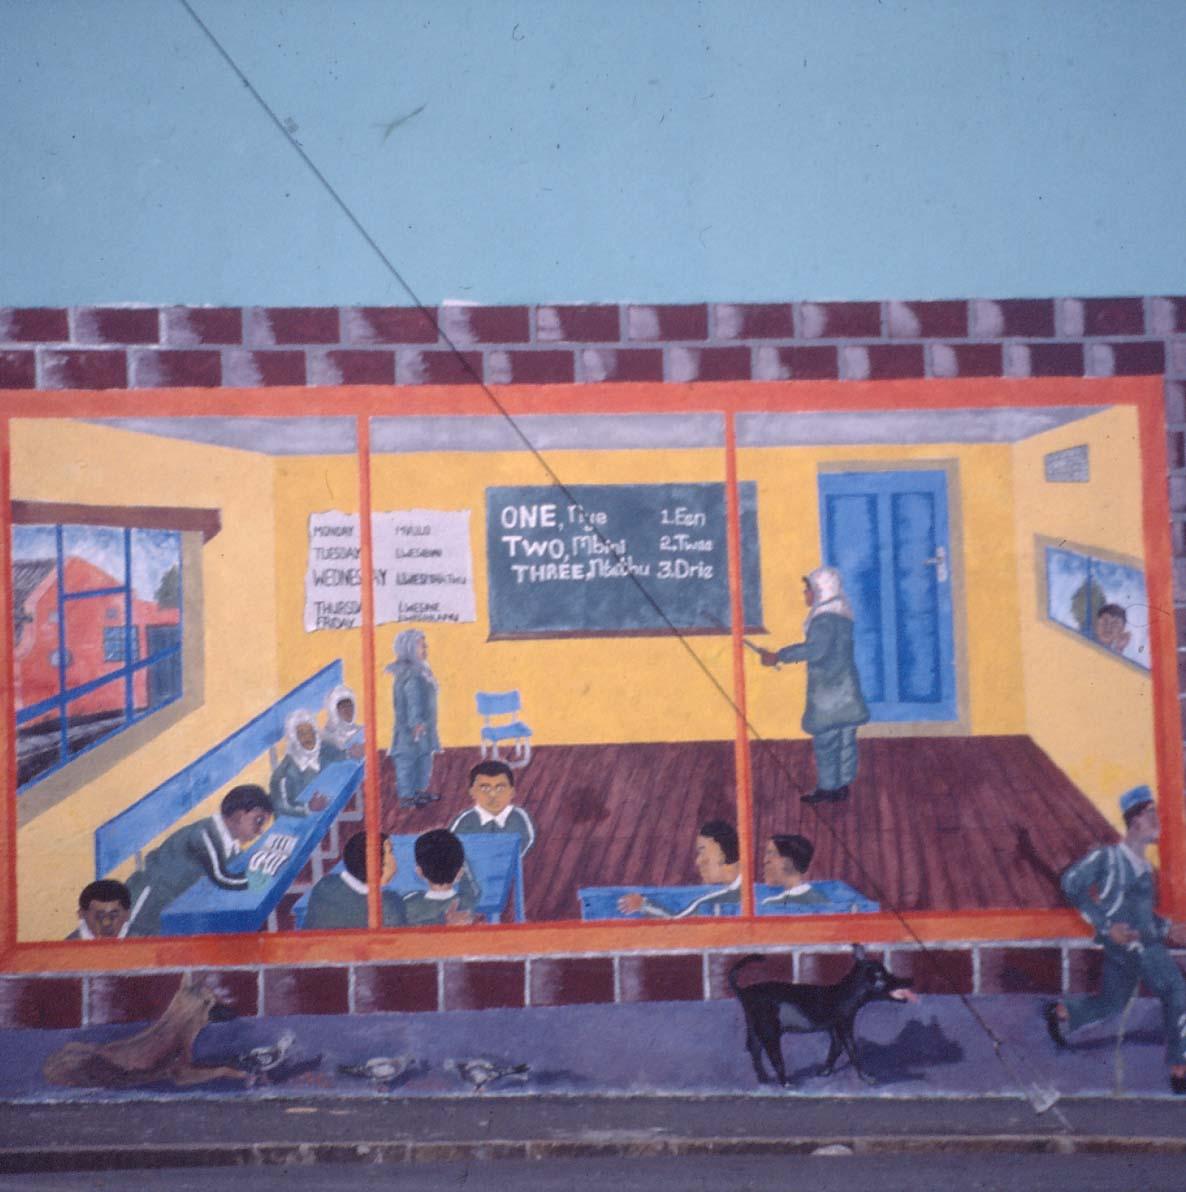 Mural, 1995. Facilitator: Mary Visser. Primary School, Woodstock (Photo: M Pissarra)